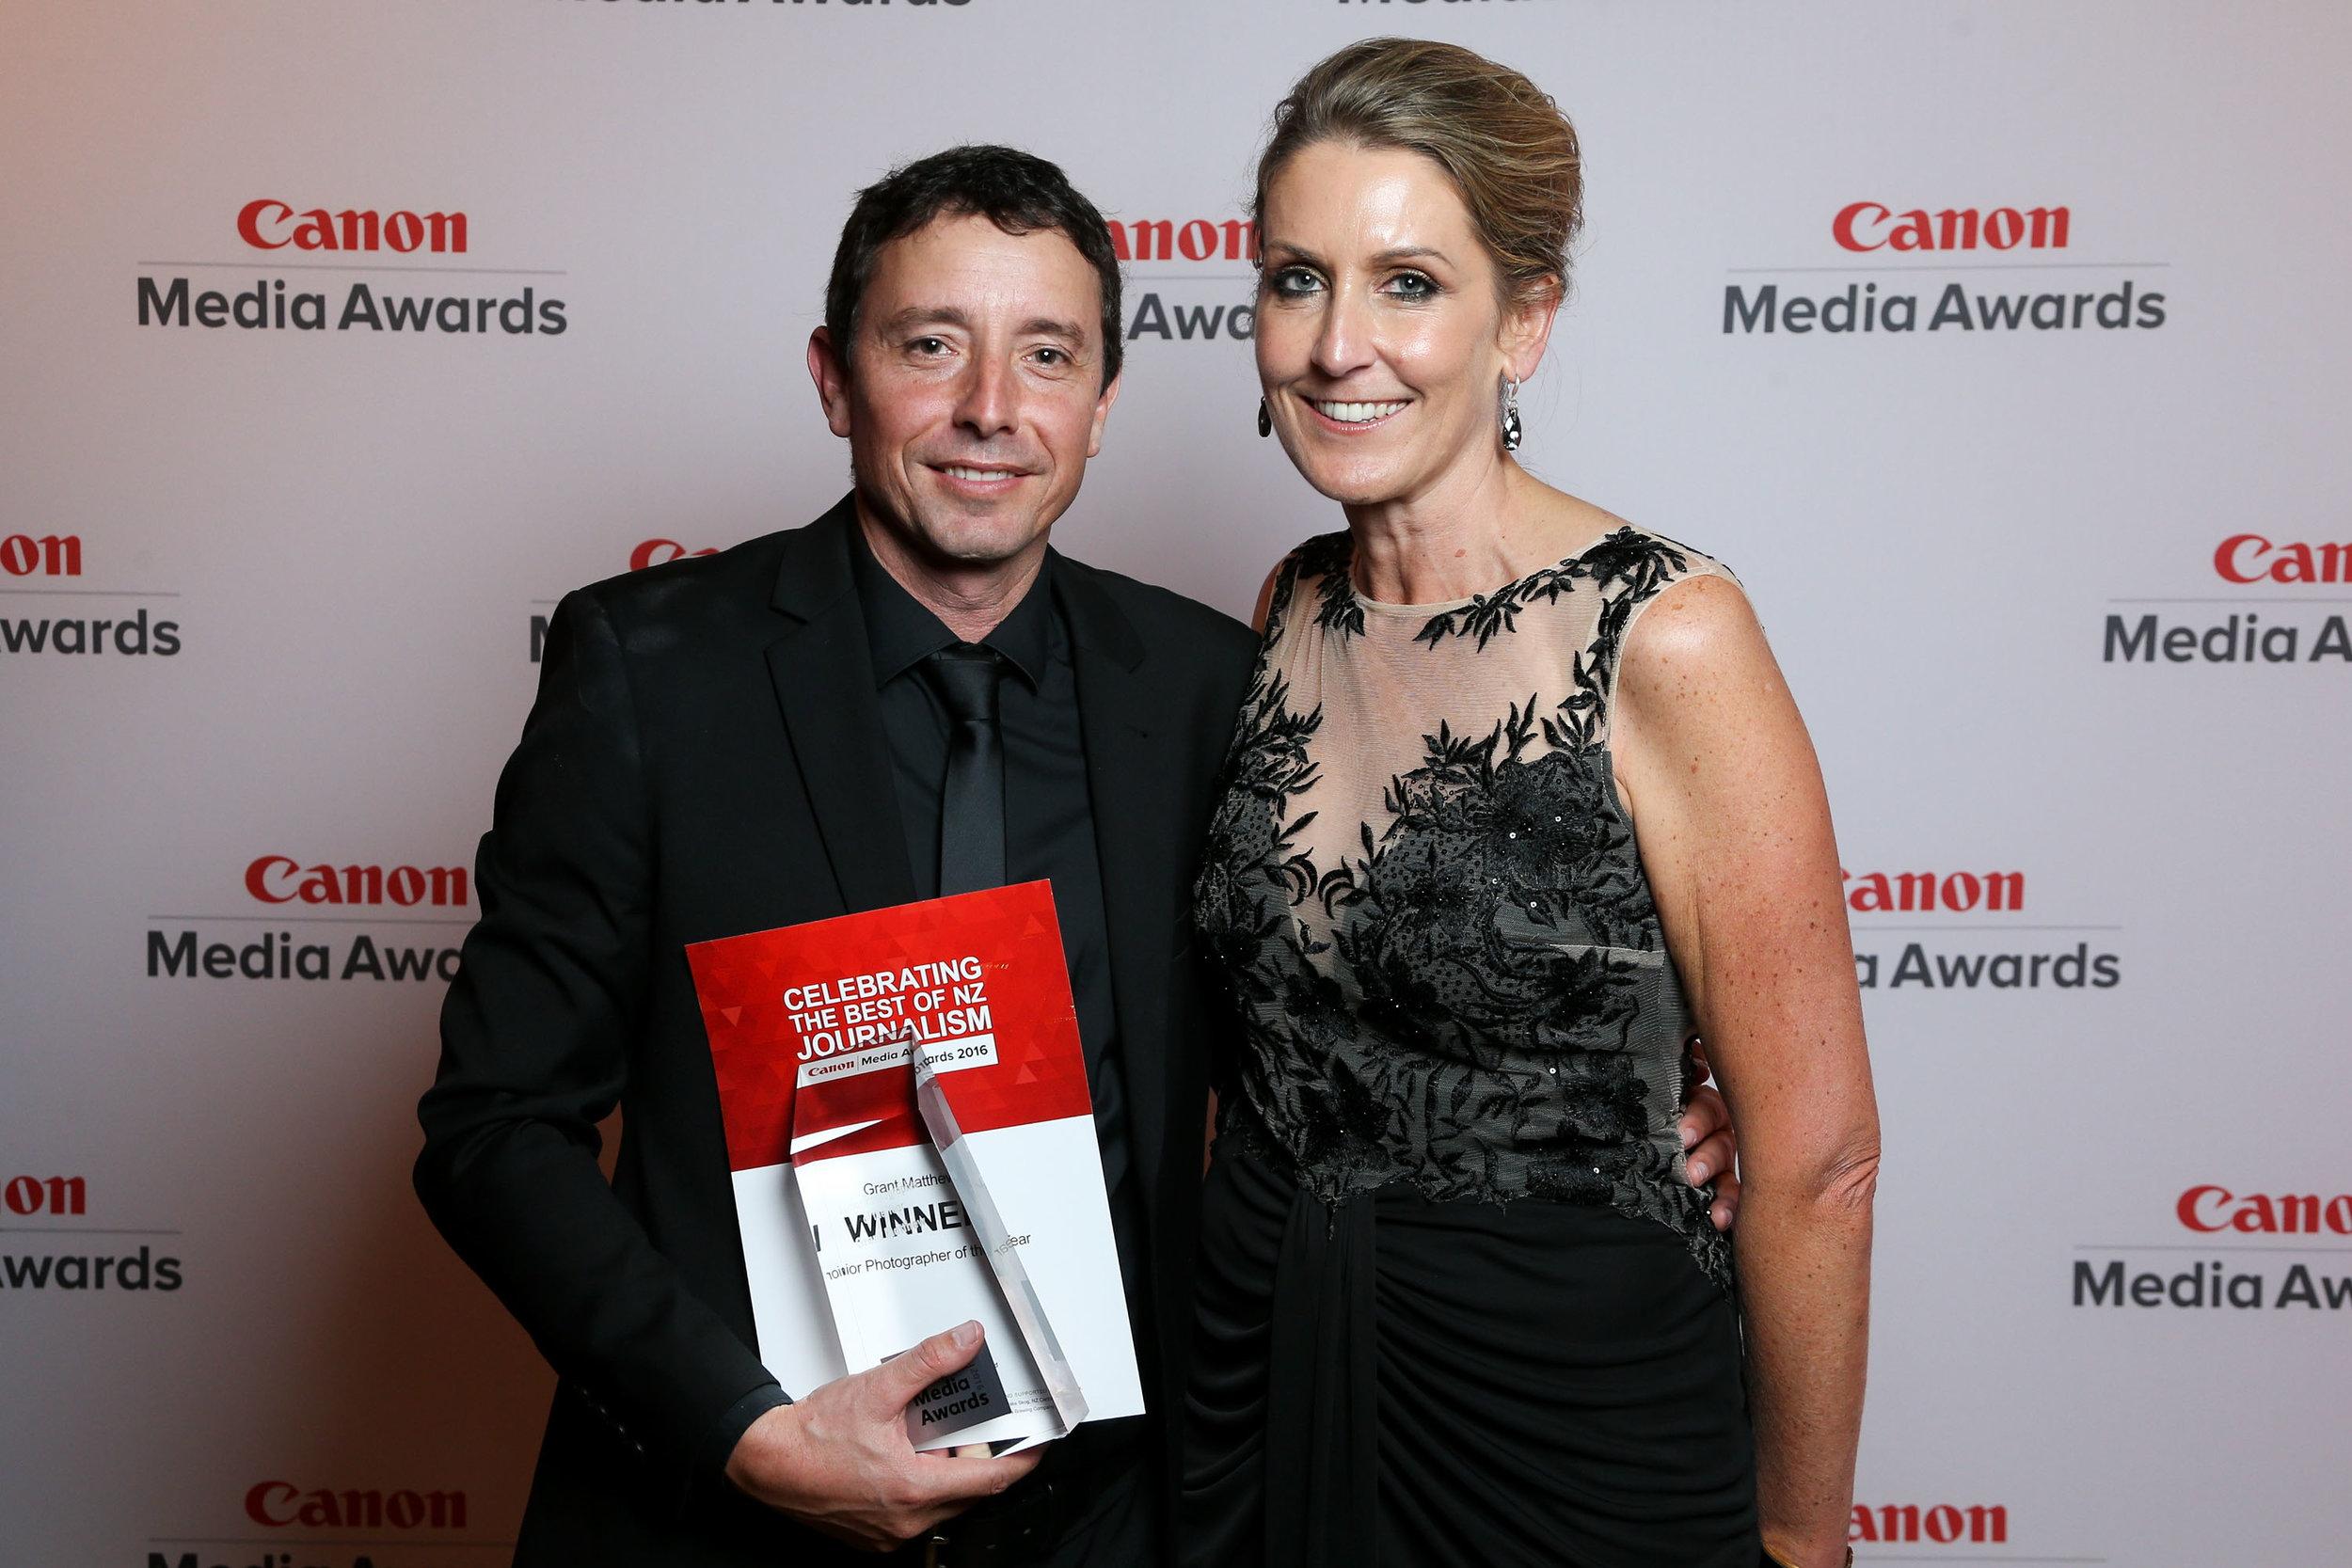 160520_Canon_Media_Awards_34.JPG